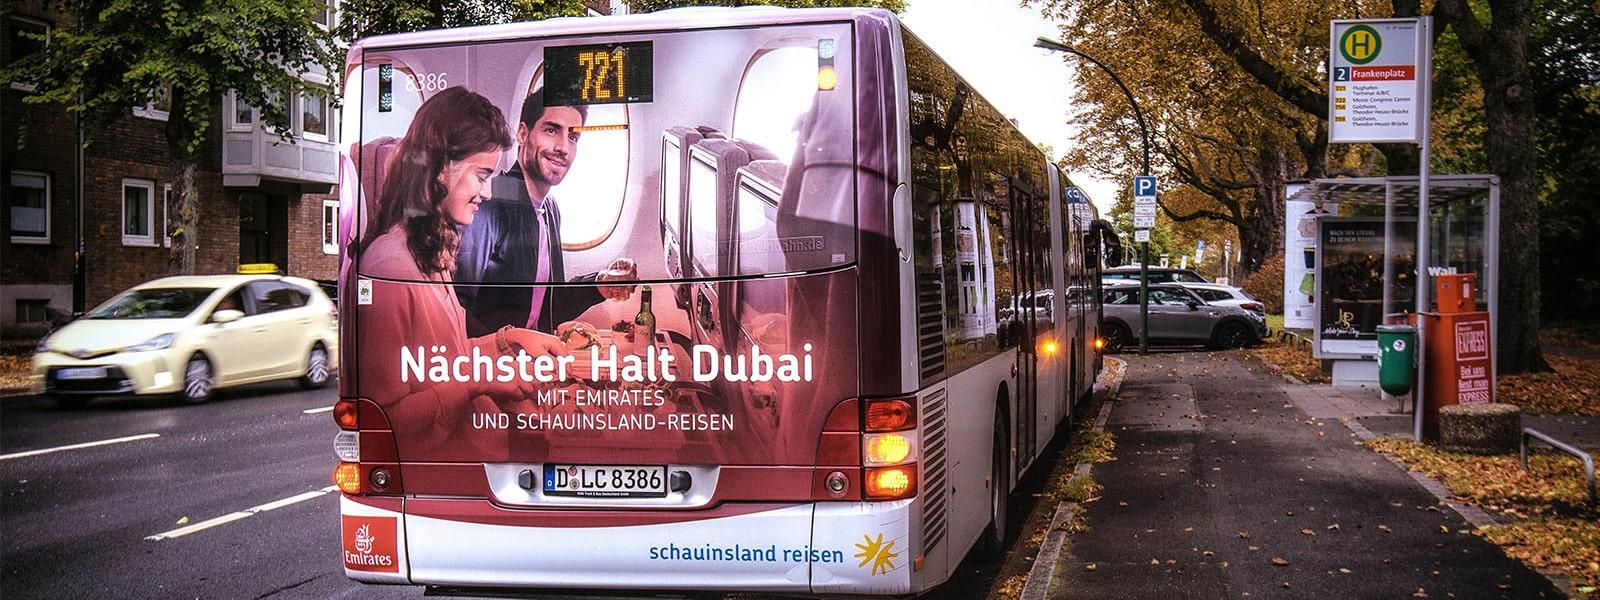 Dortmund-Verkehrsmittelwerbung-Bus-Heckflaechenwerbung